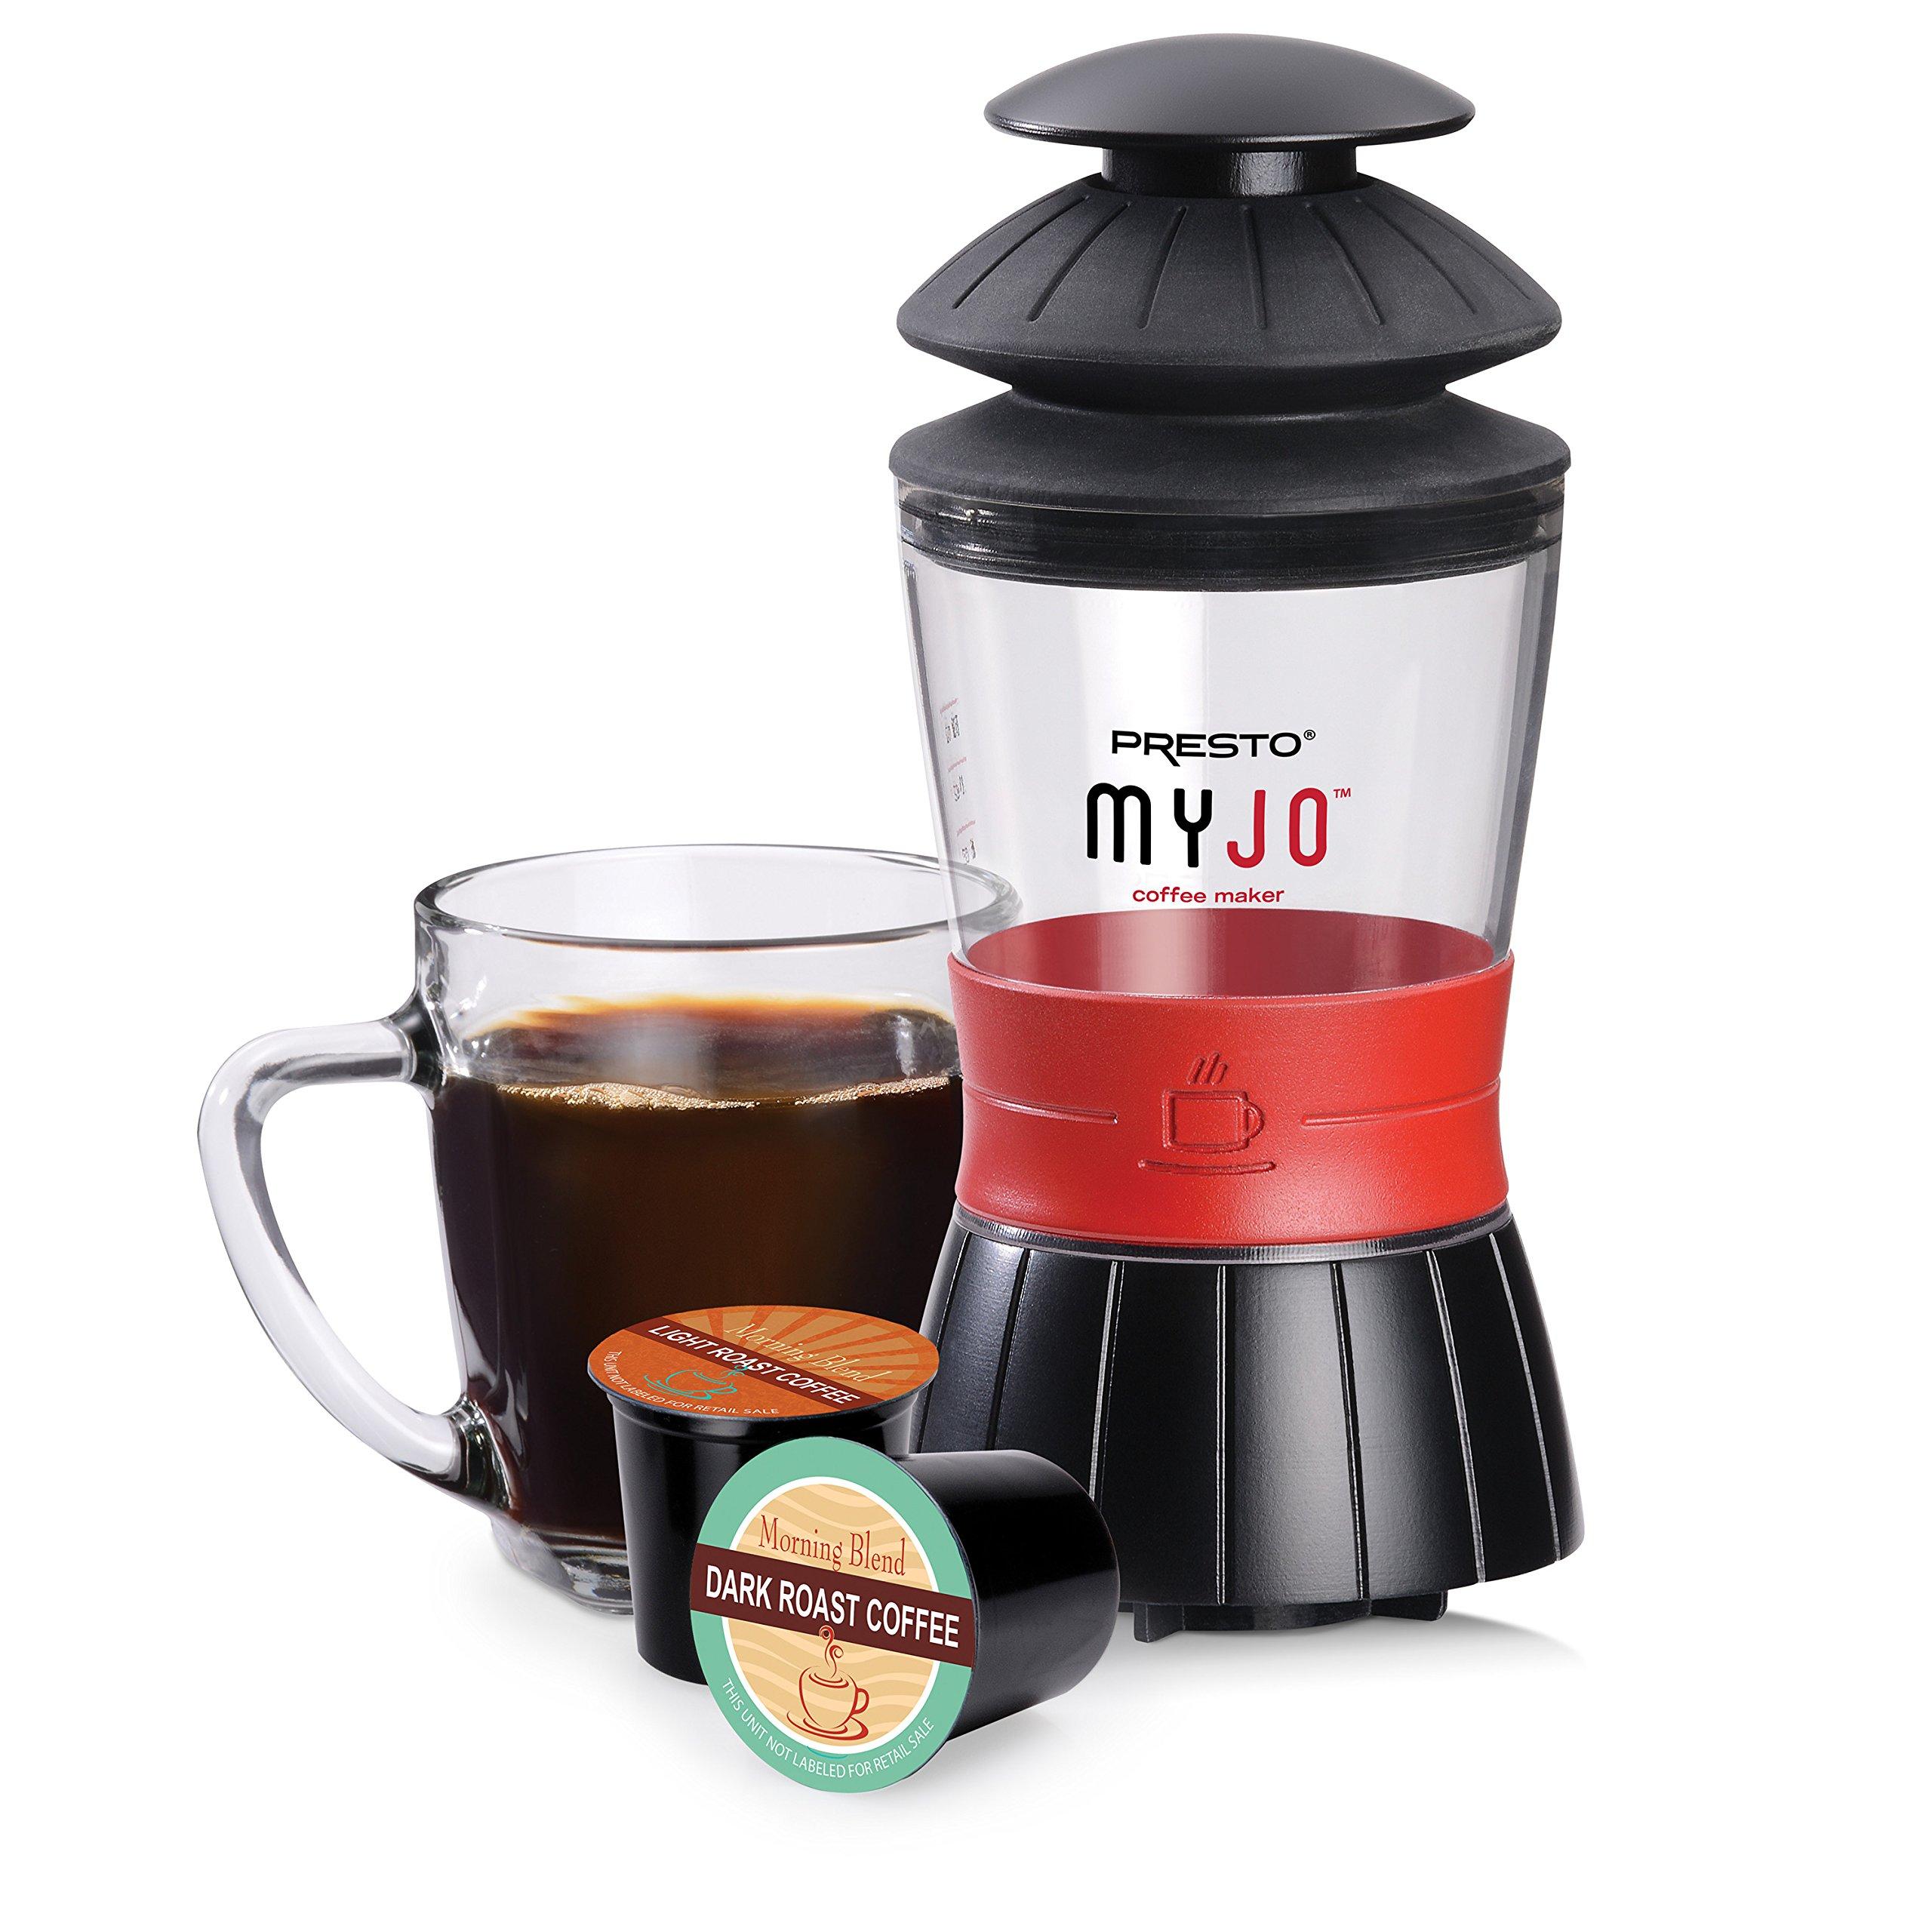 Presto 02835 MyJo Single Cup Coffee Maker by Presto (Image #2)